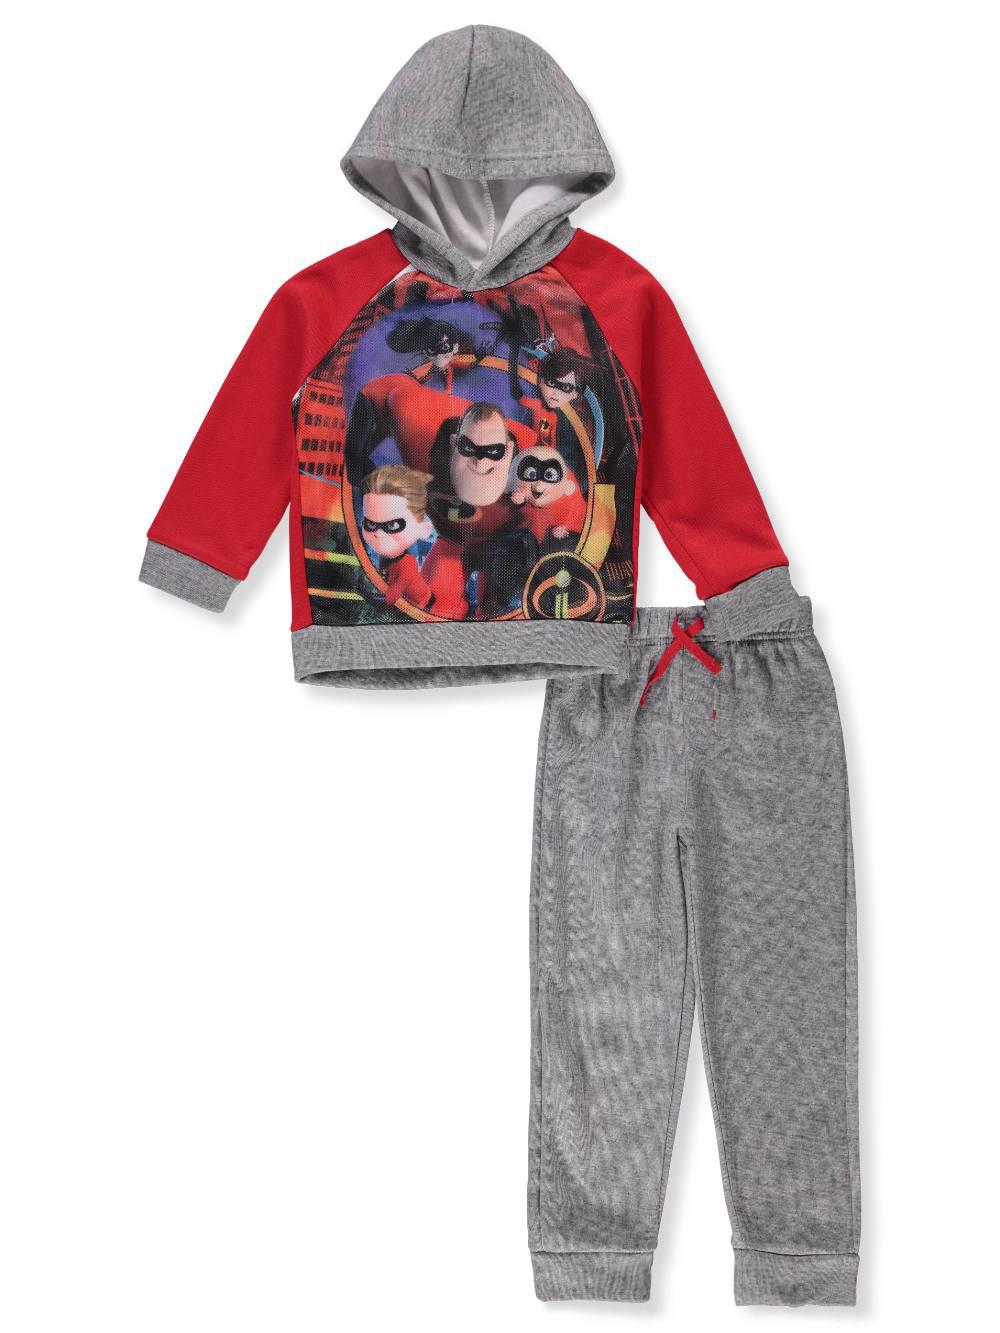 Disney Incredibles Boys' 2-Piece Pants Set Outfit